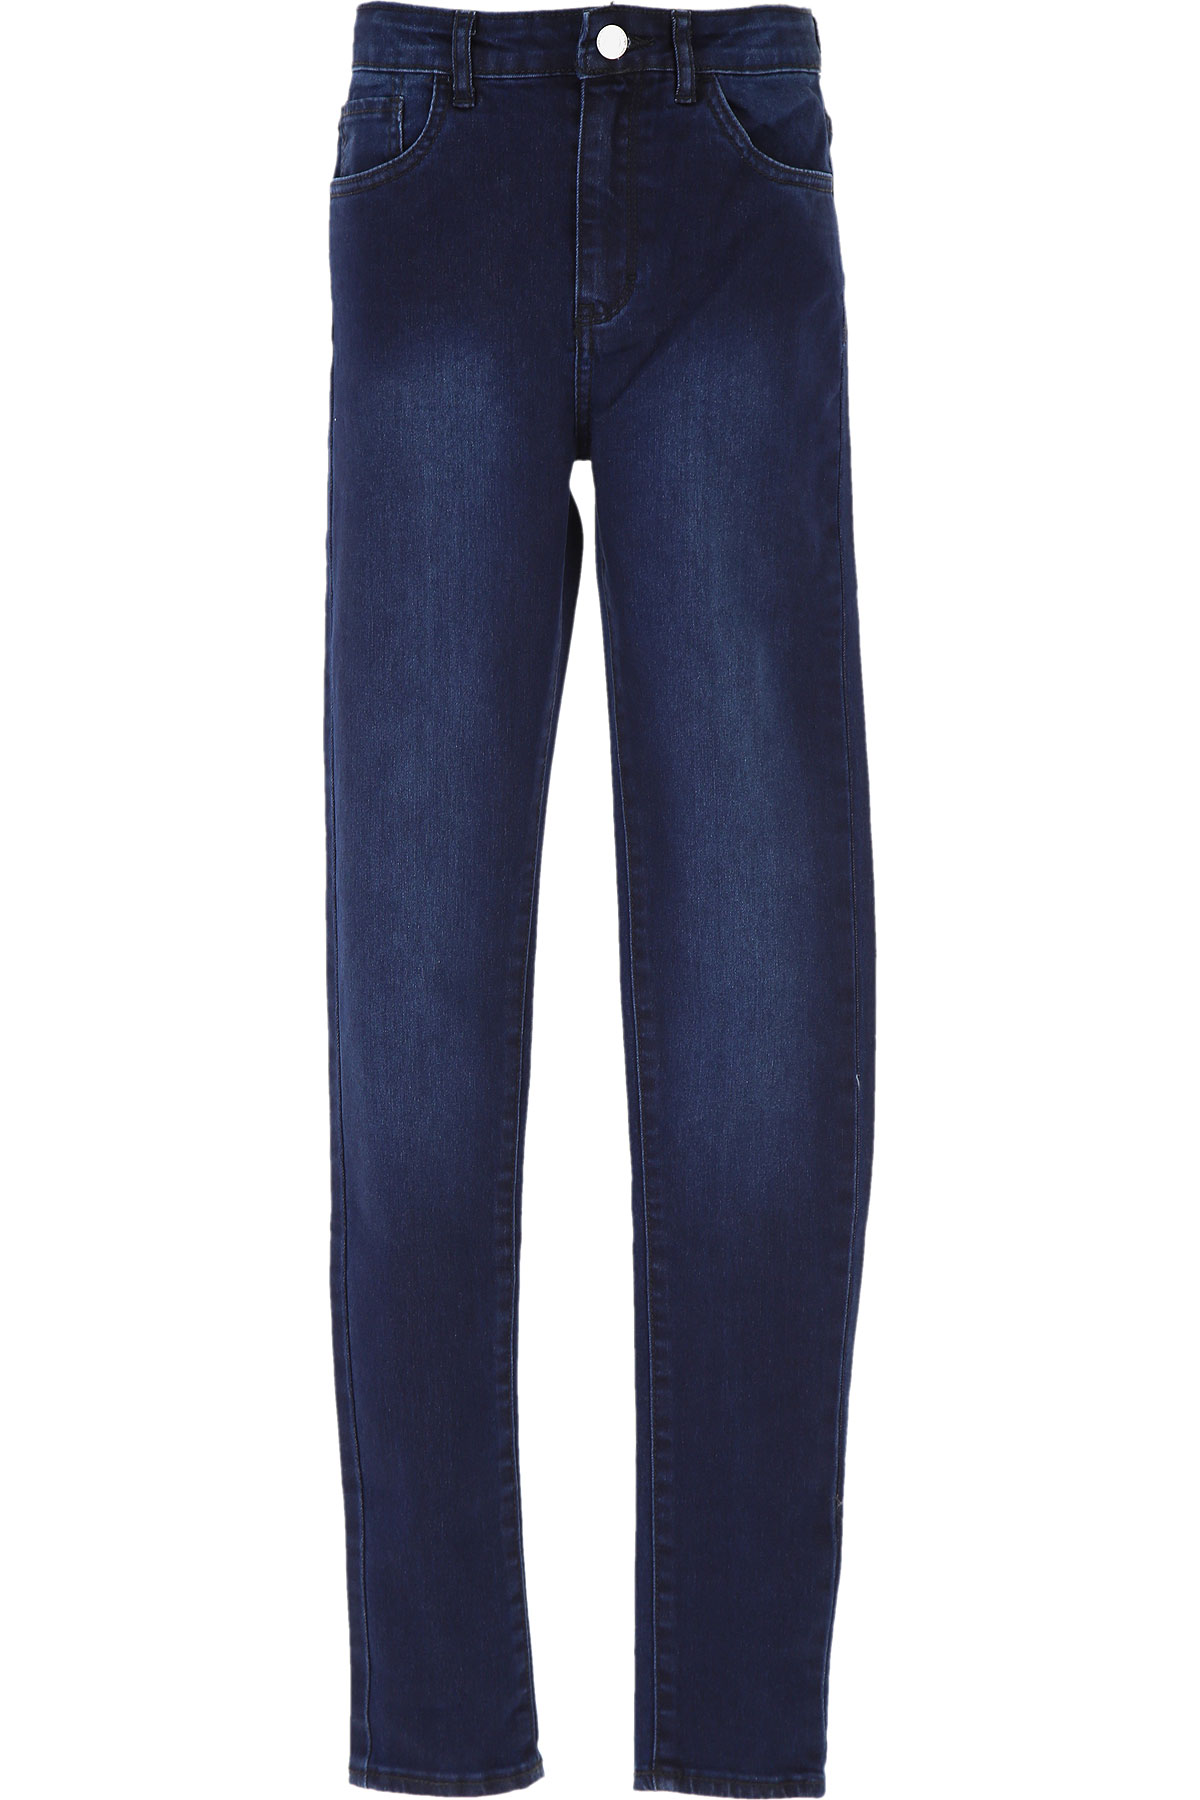 Levis Kids Jeans for Girls On Sale, Dark Blue Denim, Cotton, 2019, 10Y 12Y 14Y 16Y